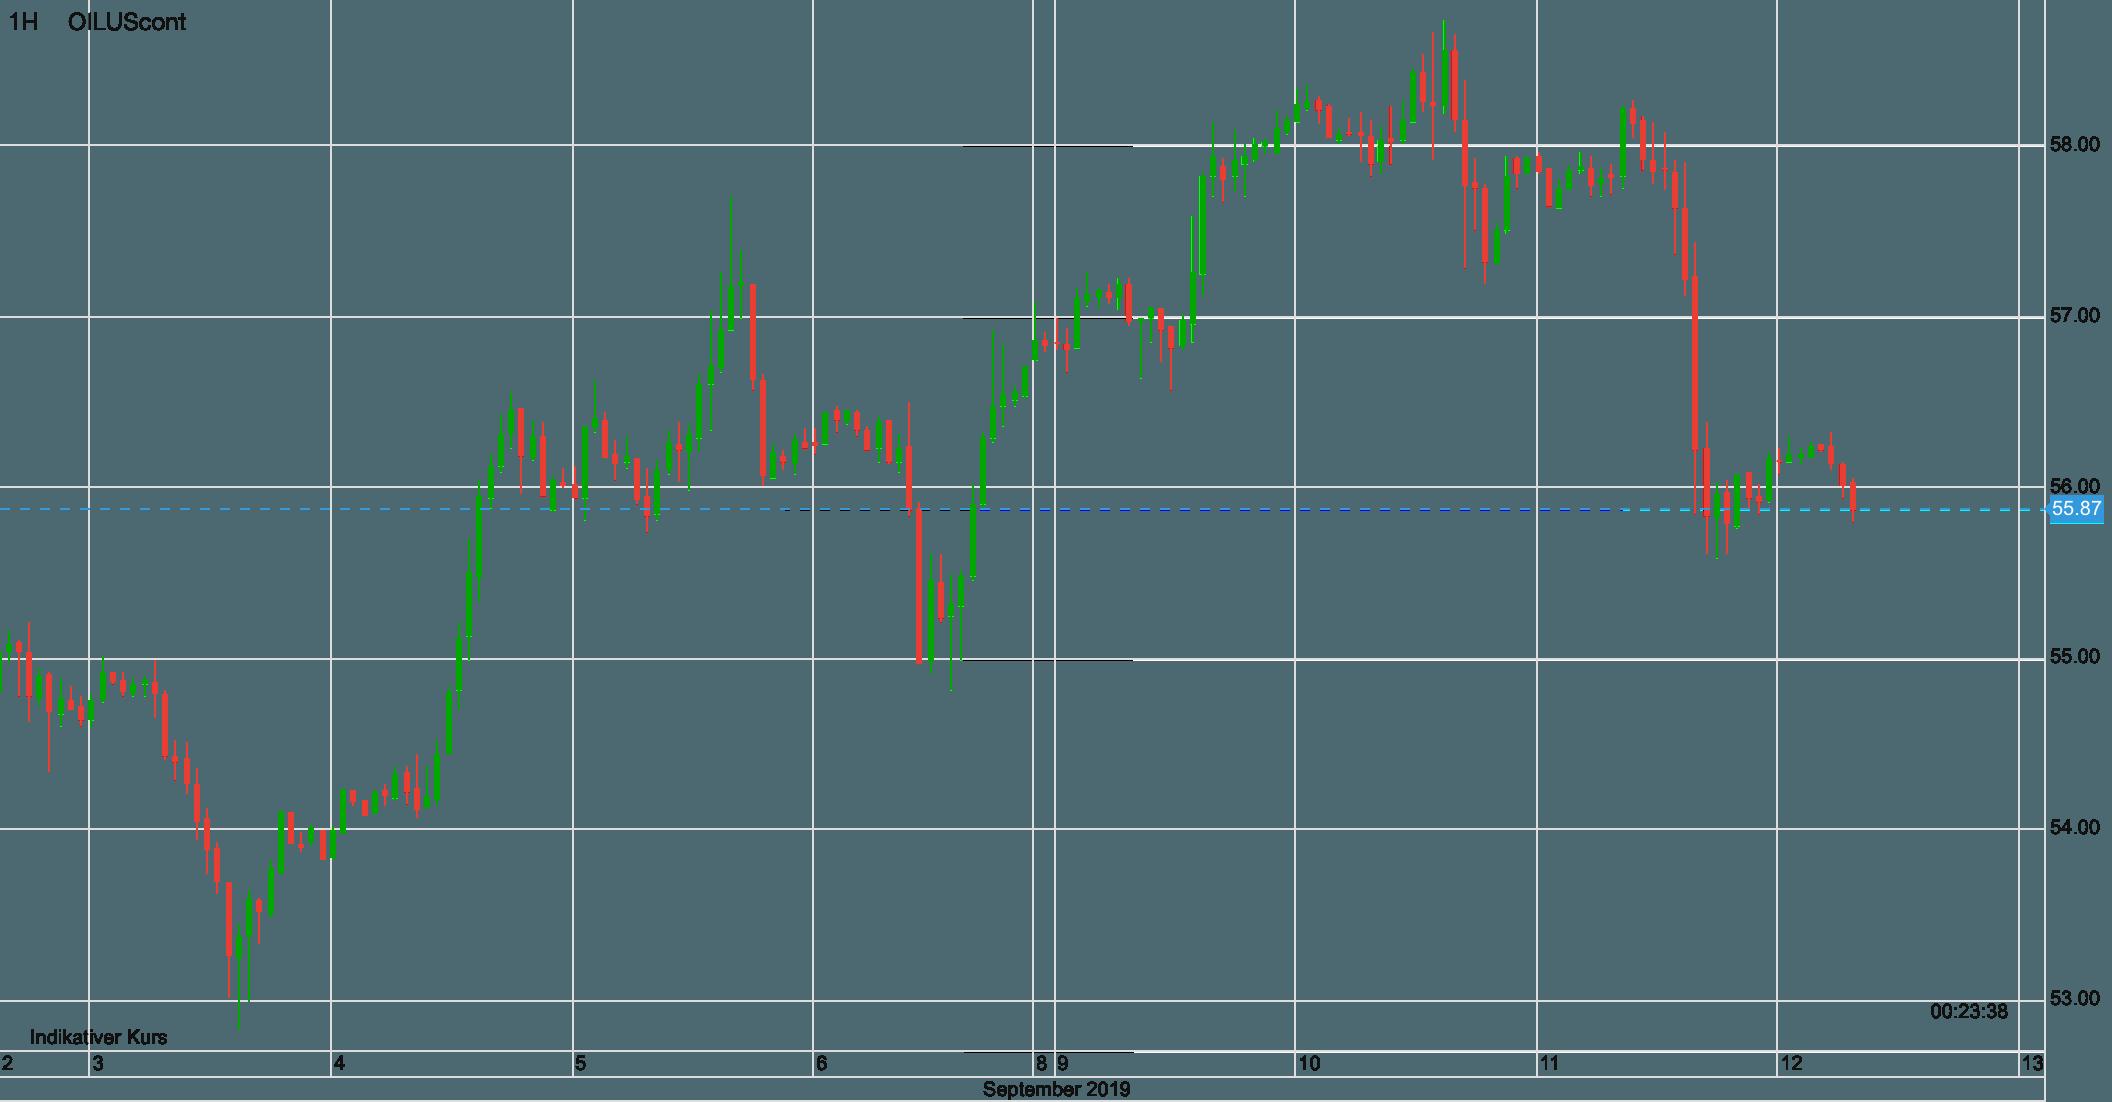 Ölpreis WTI seit dem 3. September